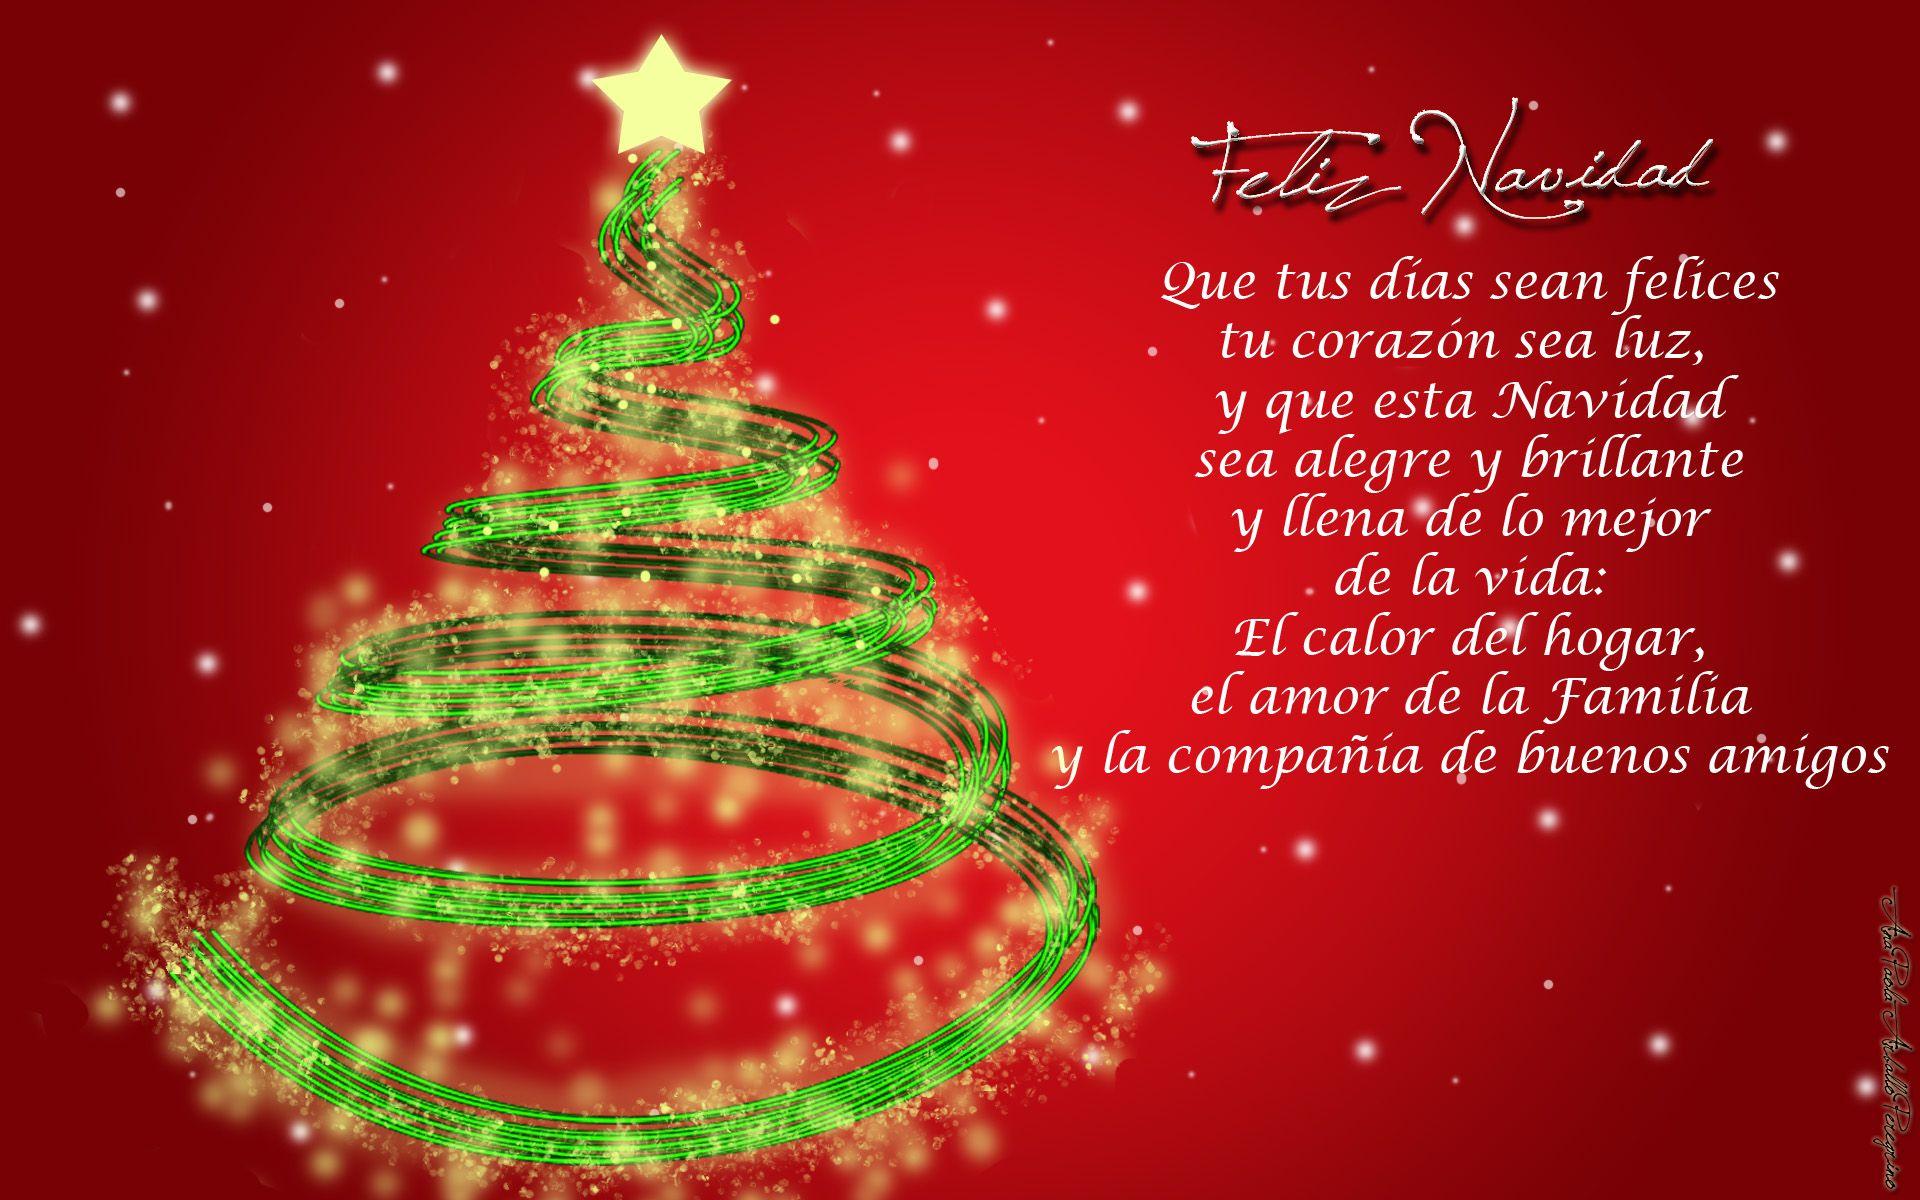 Fondos Verdes De Navidad Para Pantalla Hd 2 Hd Wallpapers: Fondos De Navidad Con Frases Para Fondo De Pantalla En Hd